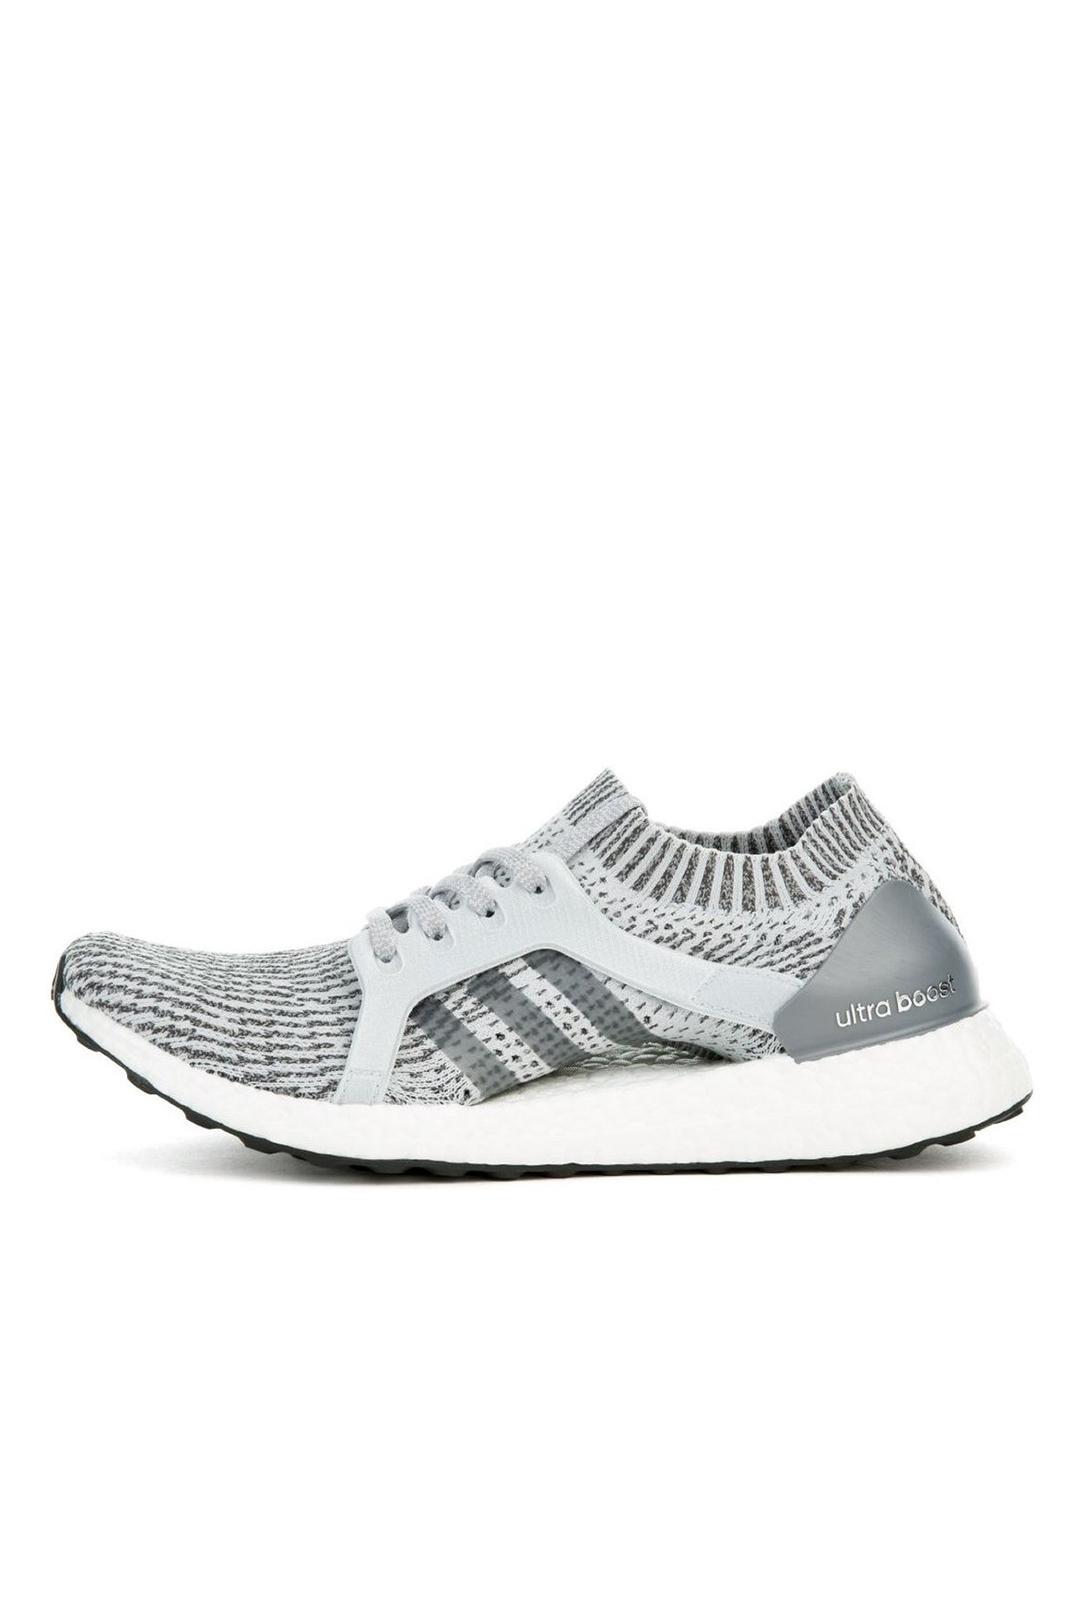 Baskets / Sneakers  Adidas BB1695 ULTRABOOST X GREY